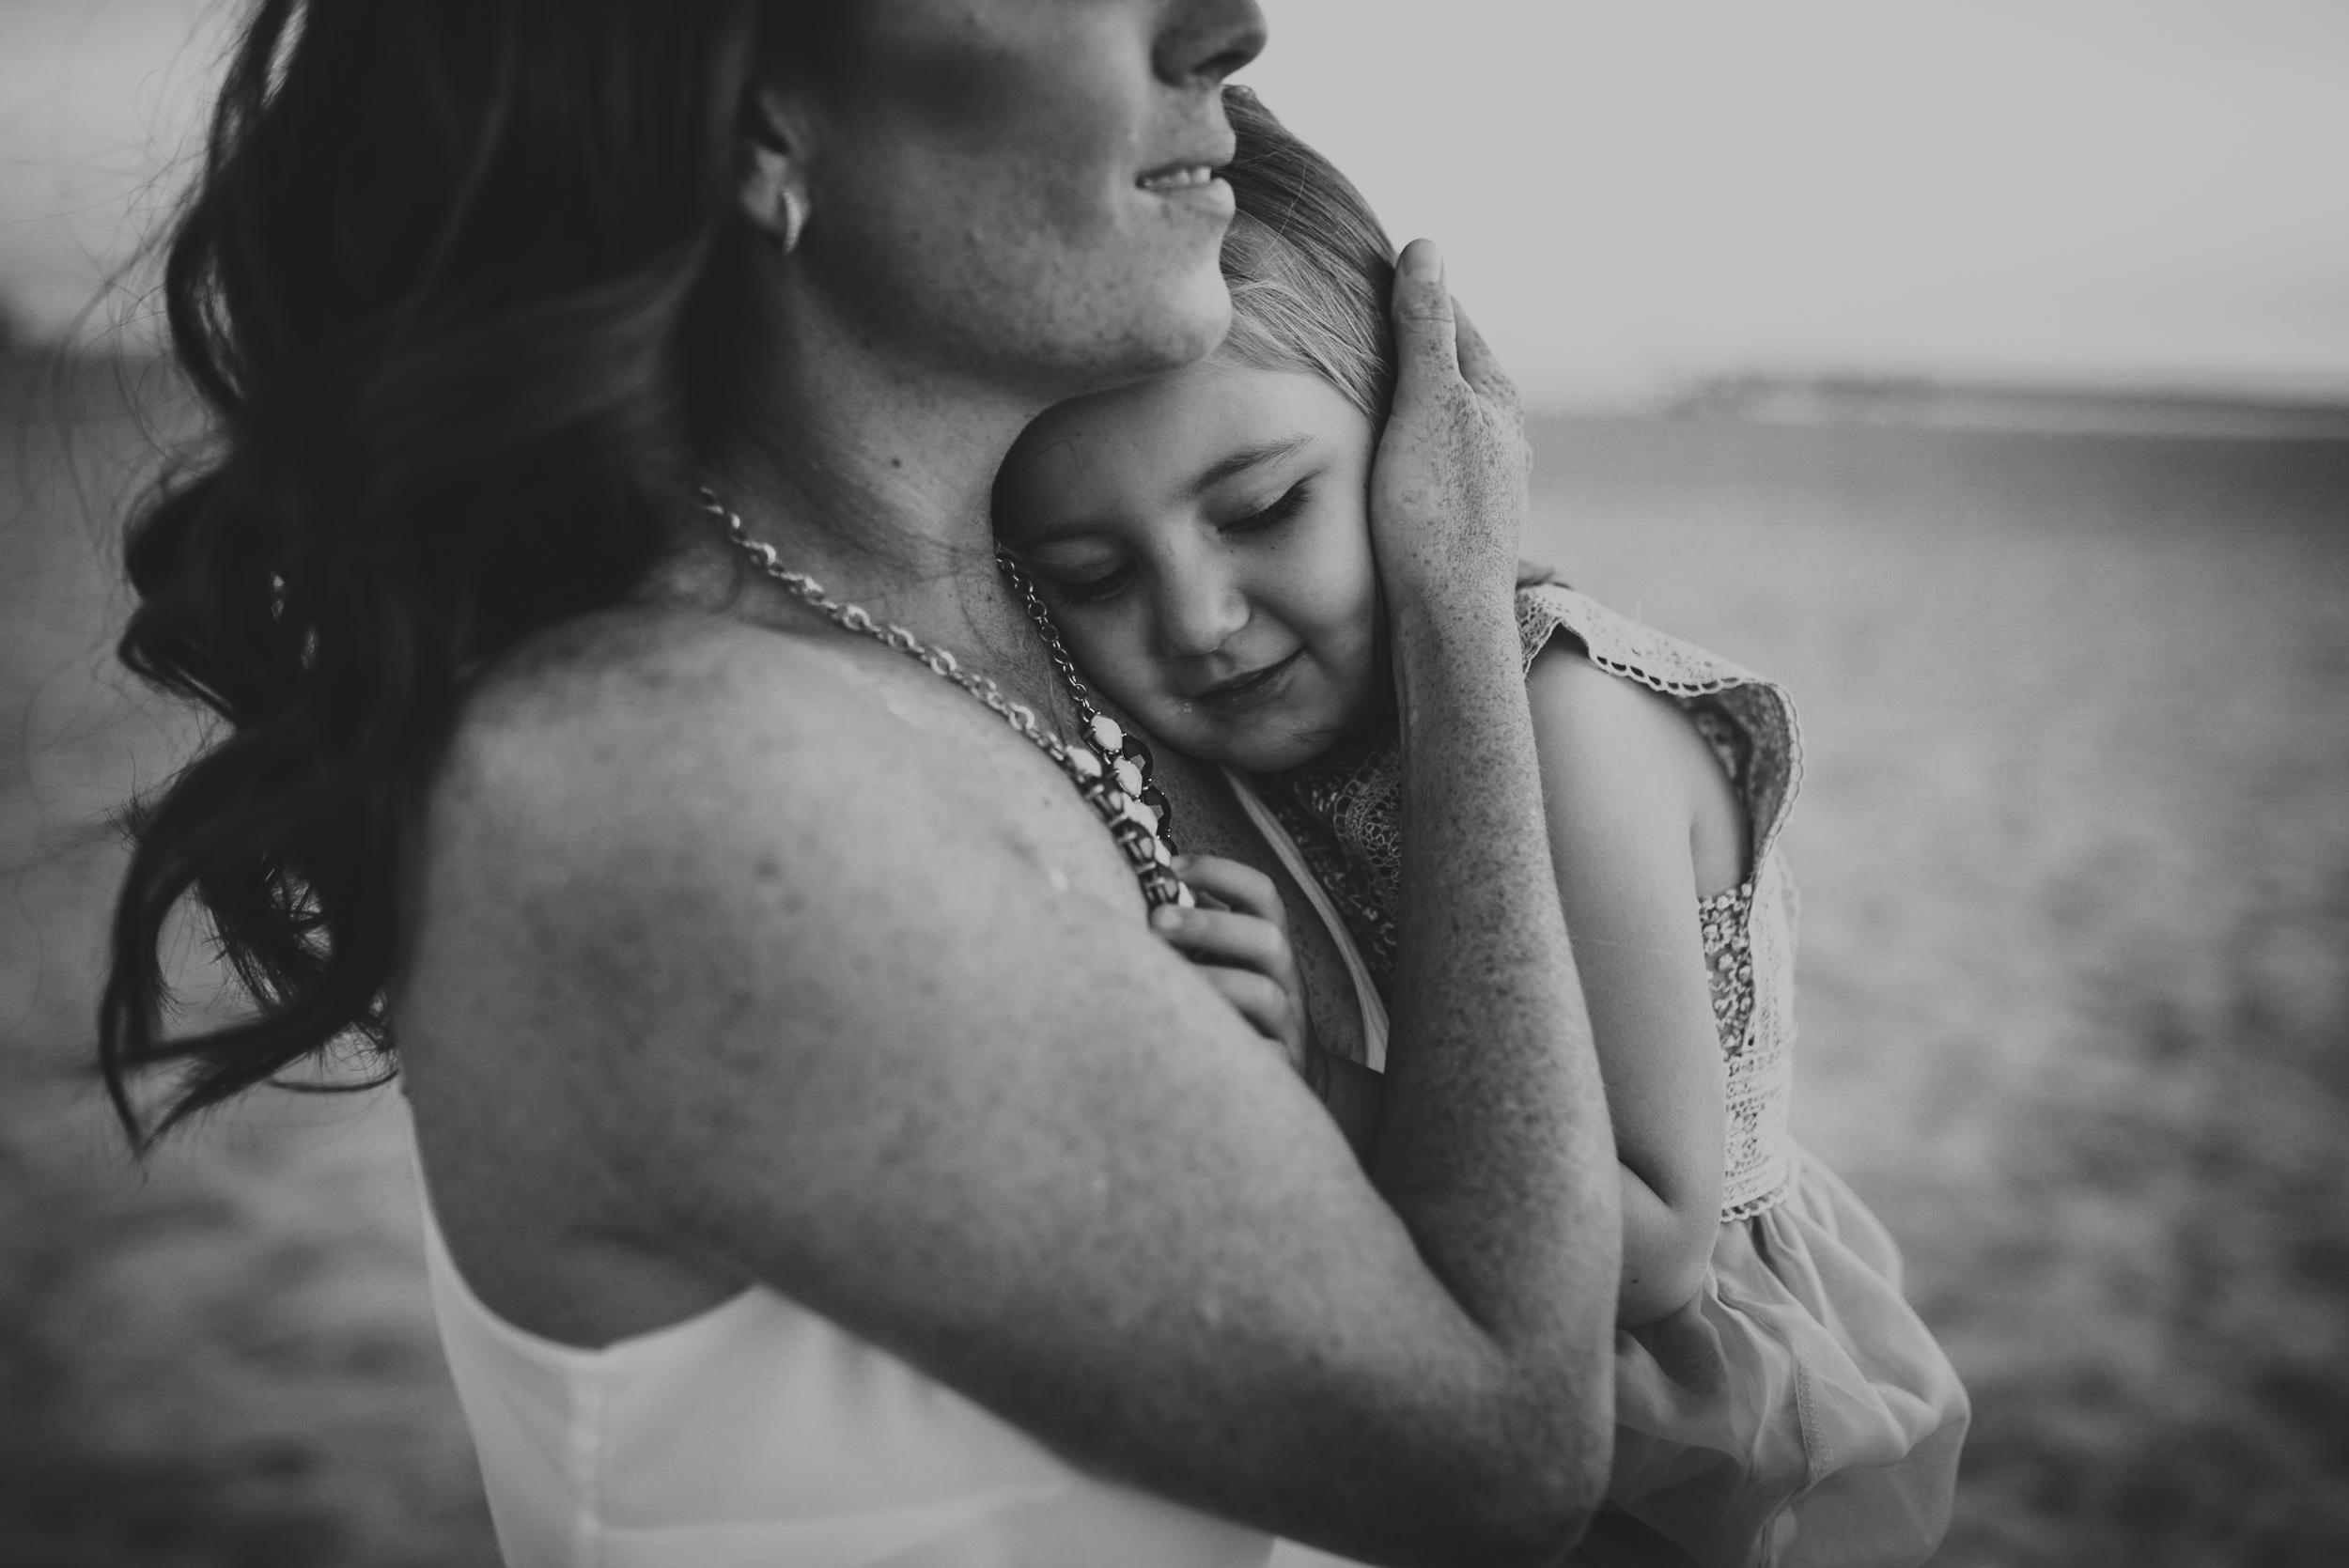 2018-San-Diego-Family-Lifestyle-Newborn-Travel-Vacation-Photographer-Kelsey-Smith-Photography-Coronado-La-Jolla-Encinitas-Solana-Beach-Del-Mar-195.jpg